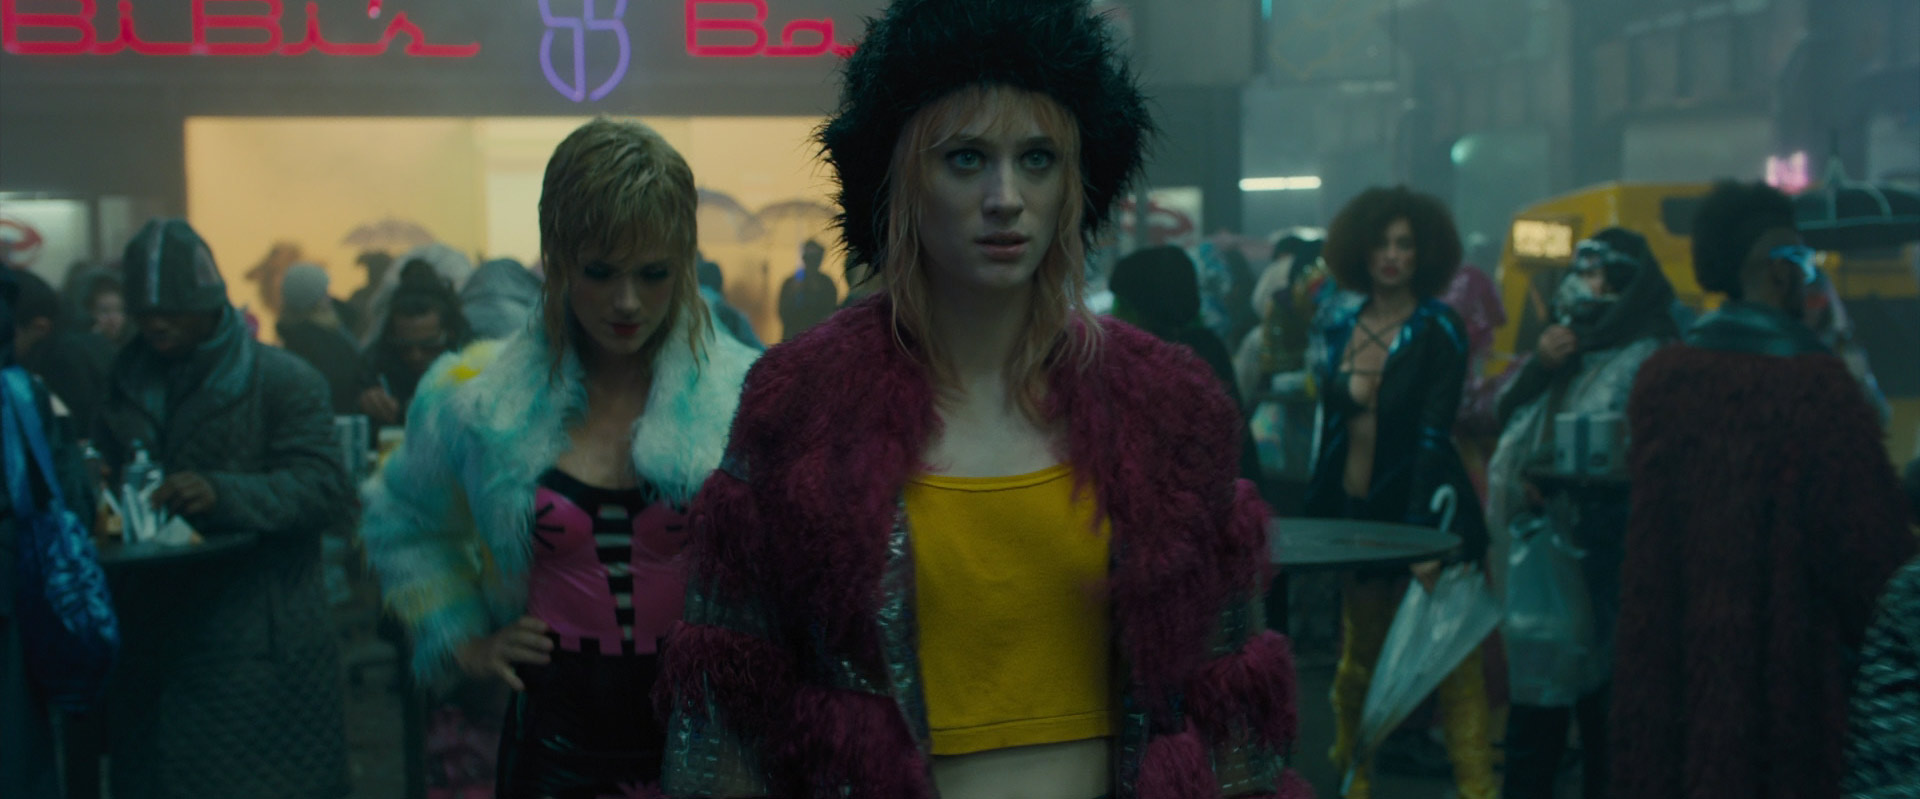 Krista Kosonen Blade Runner